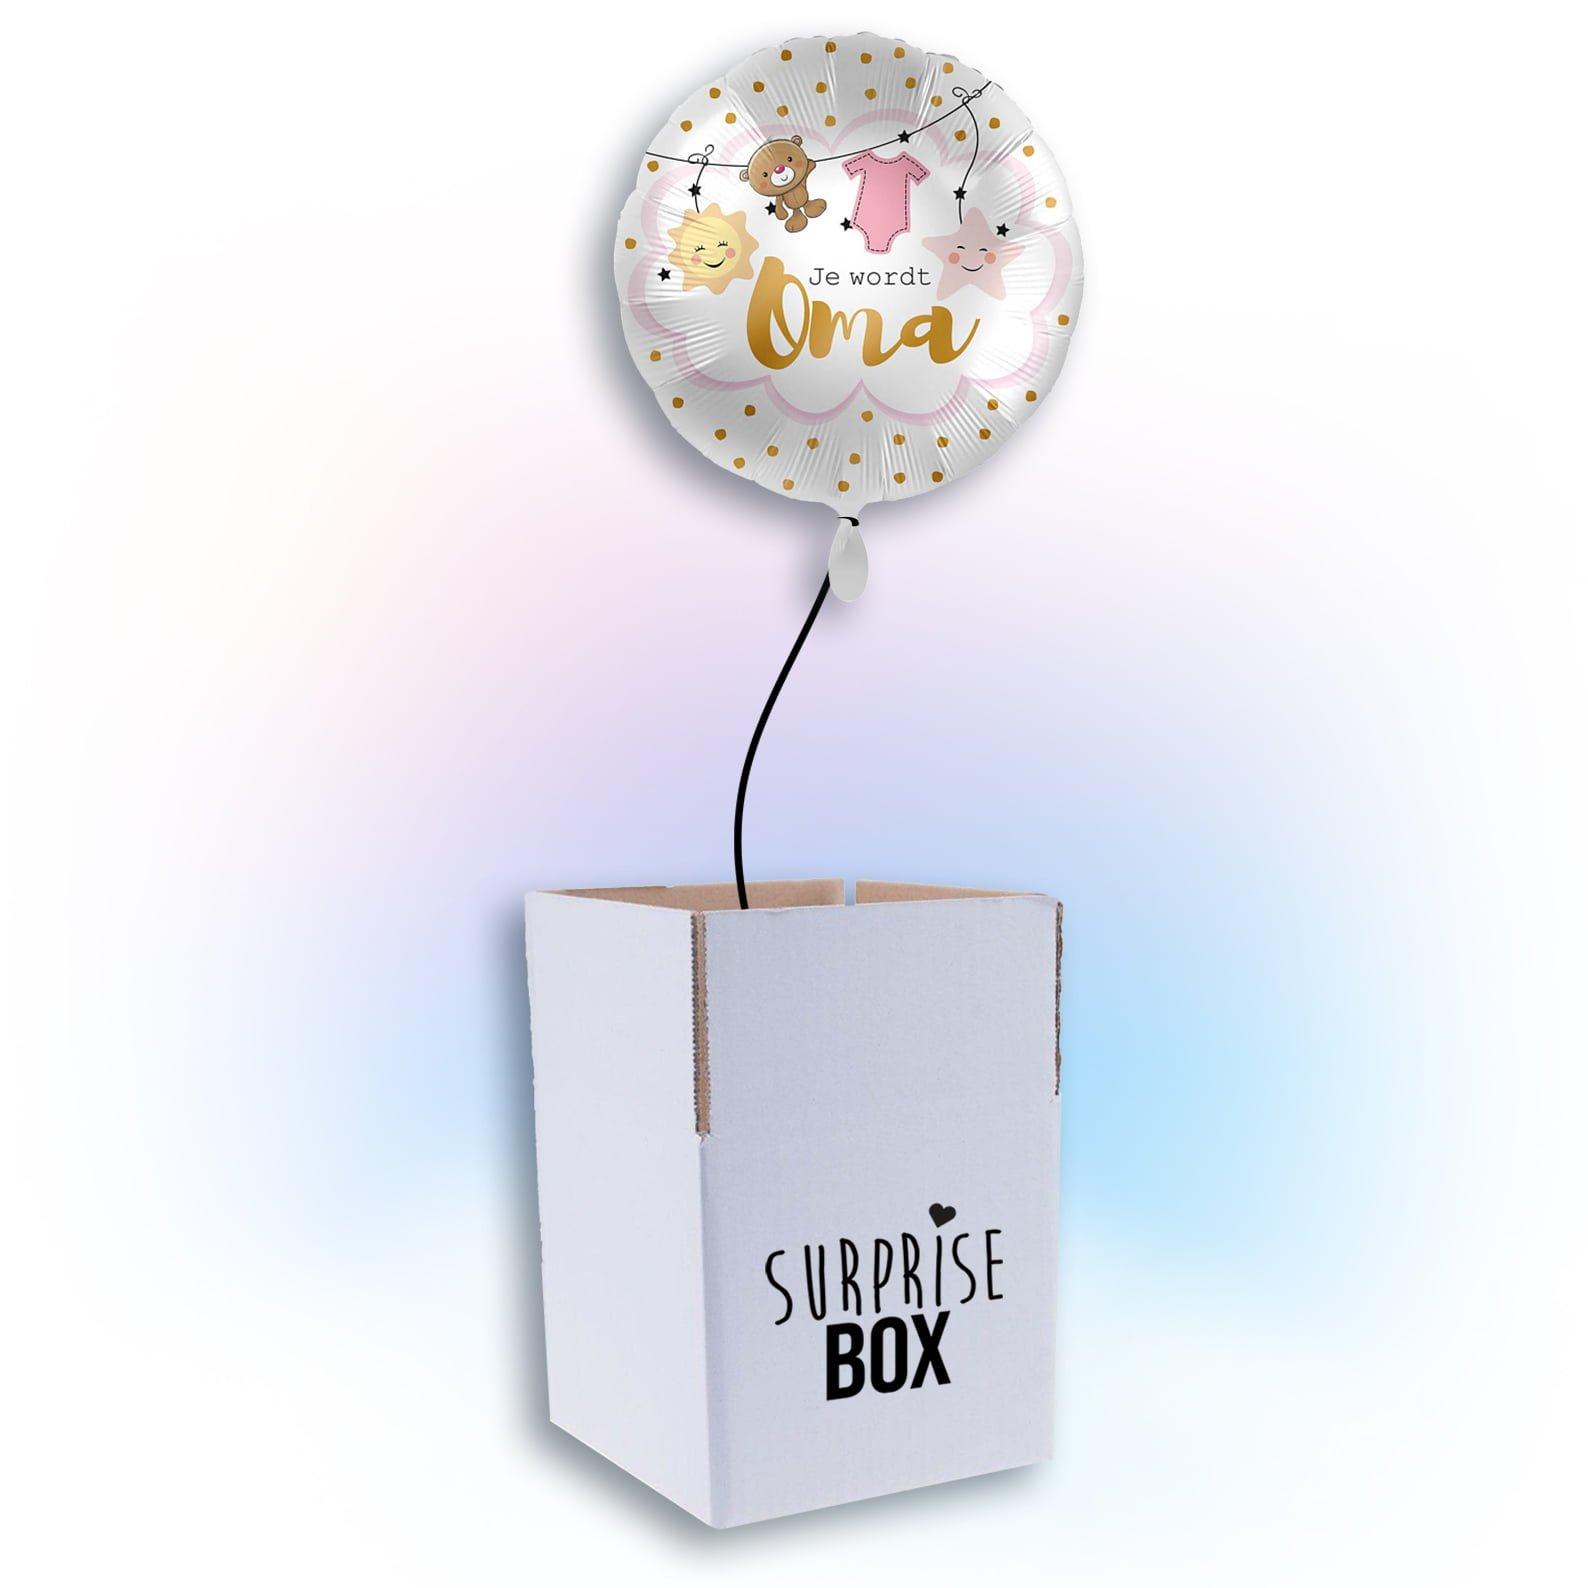 Surprise box Je wordt oma